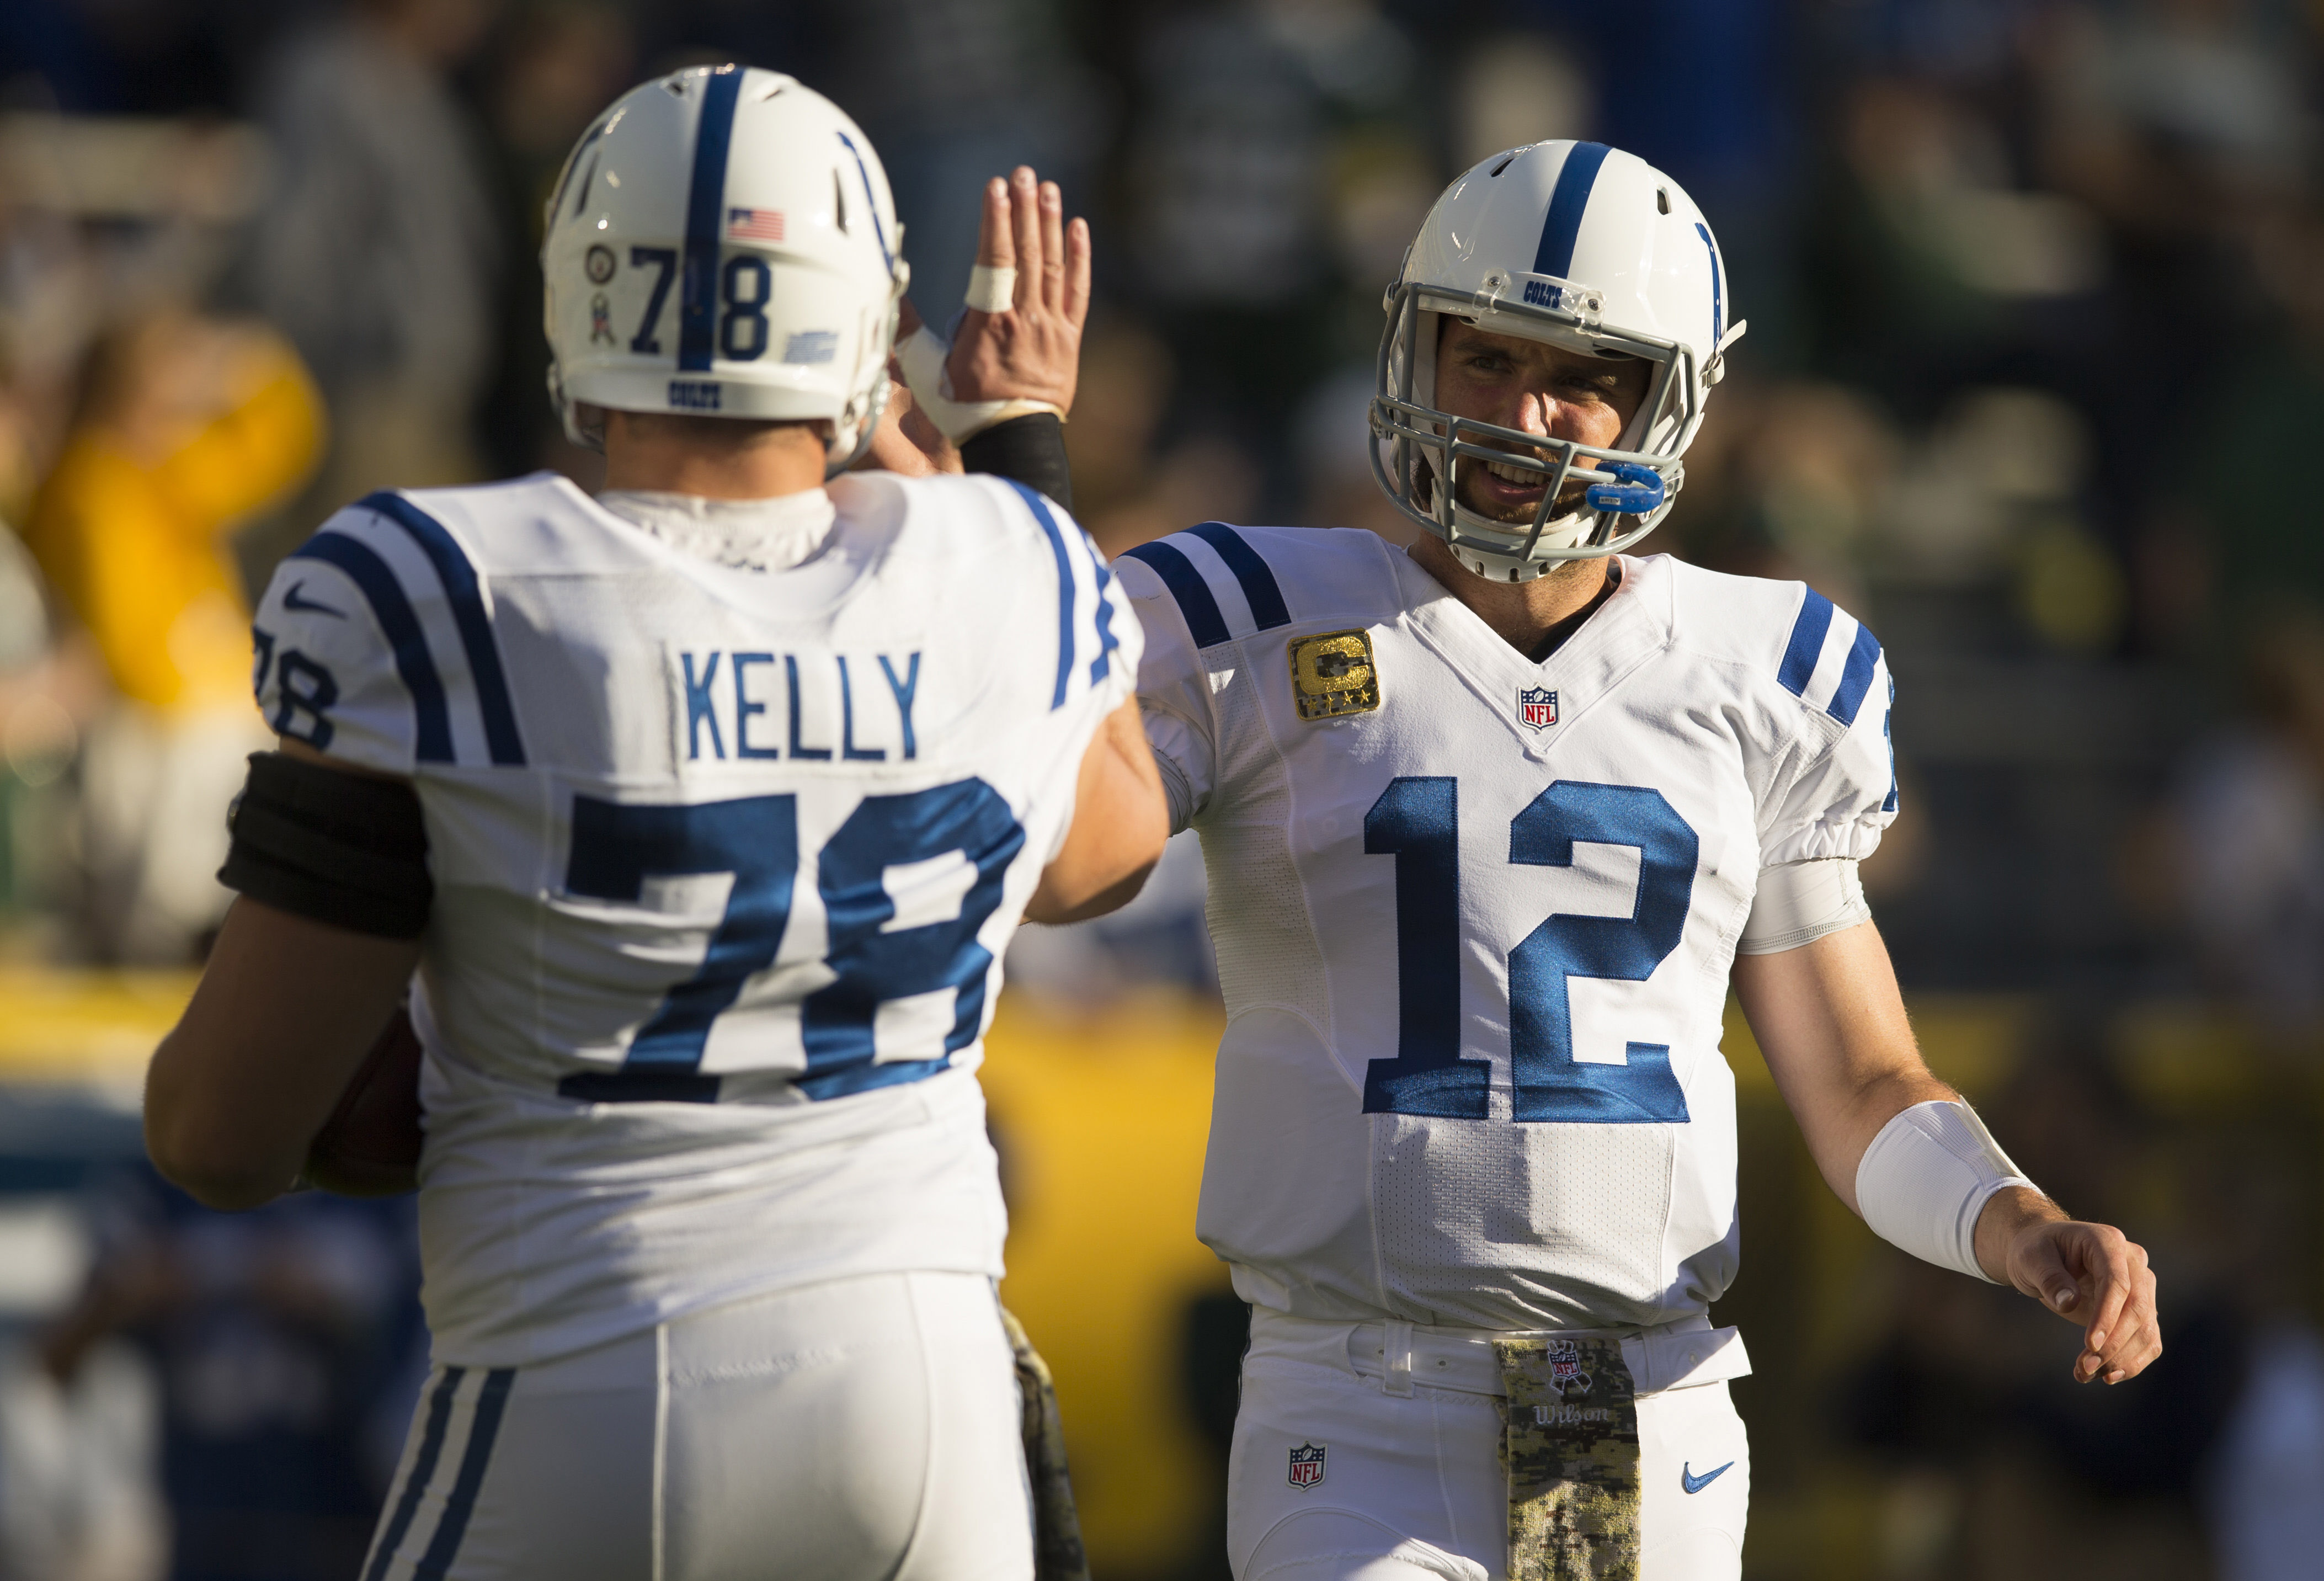 NFL: Indianapolis Colts at Green Bay Packers